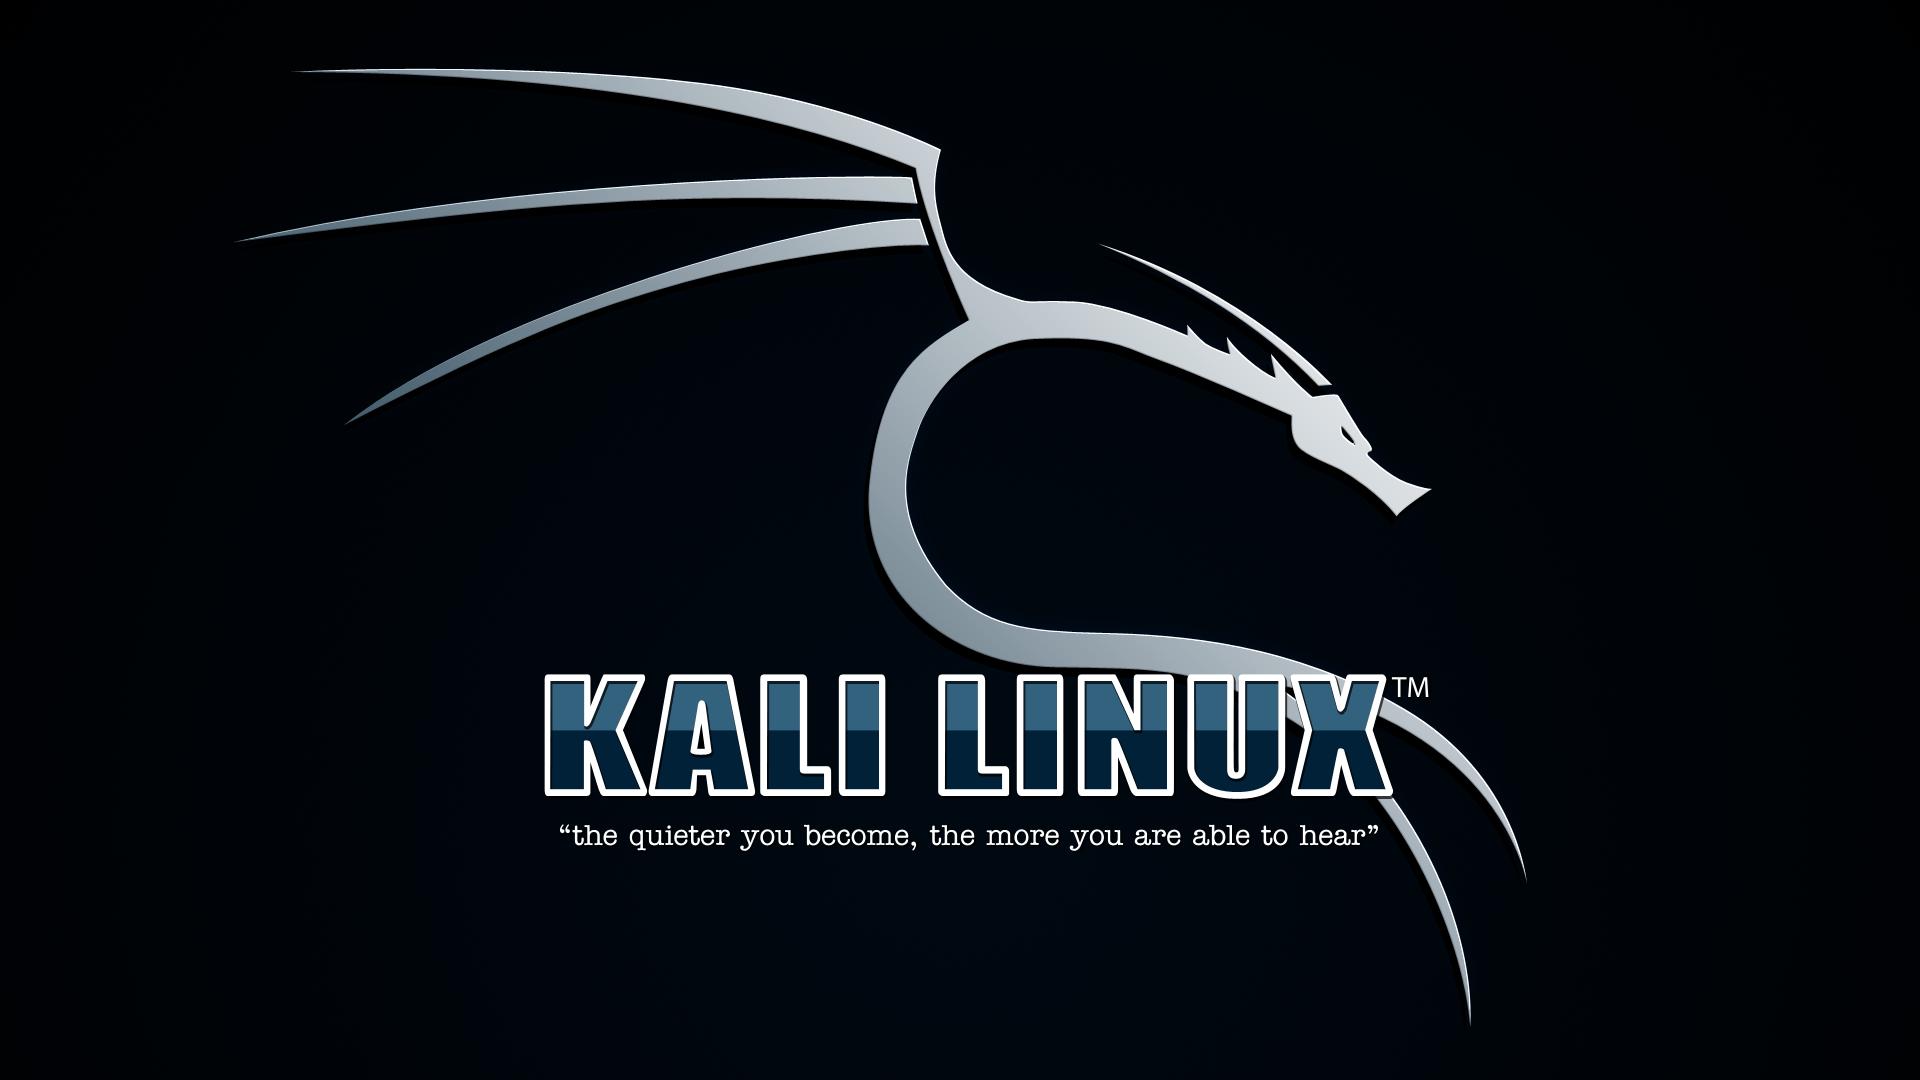 kali-wallpaper-2015-v1.1.0-1920x1080